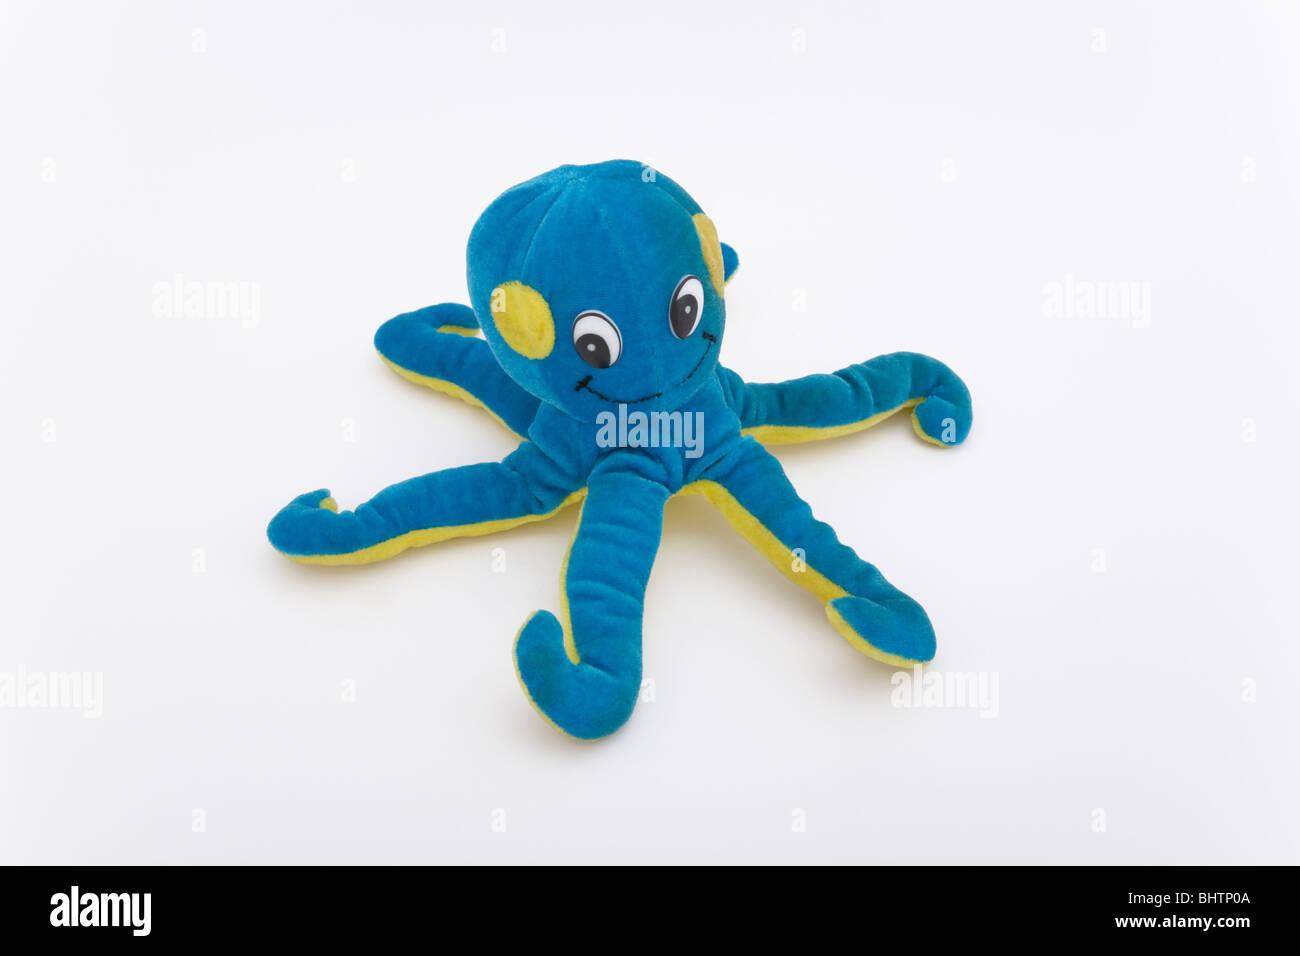 Smile Toys And Joys : Baby octopus animal stock photos